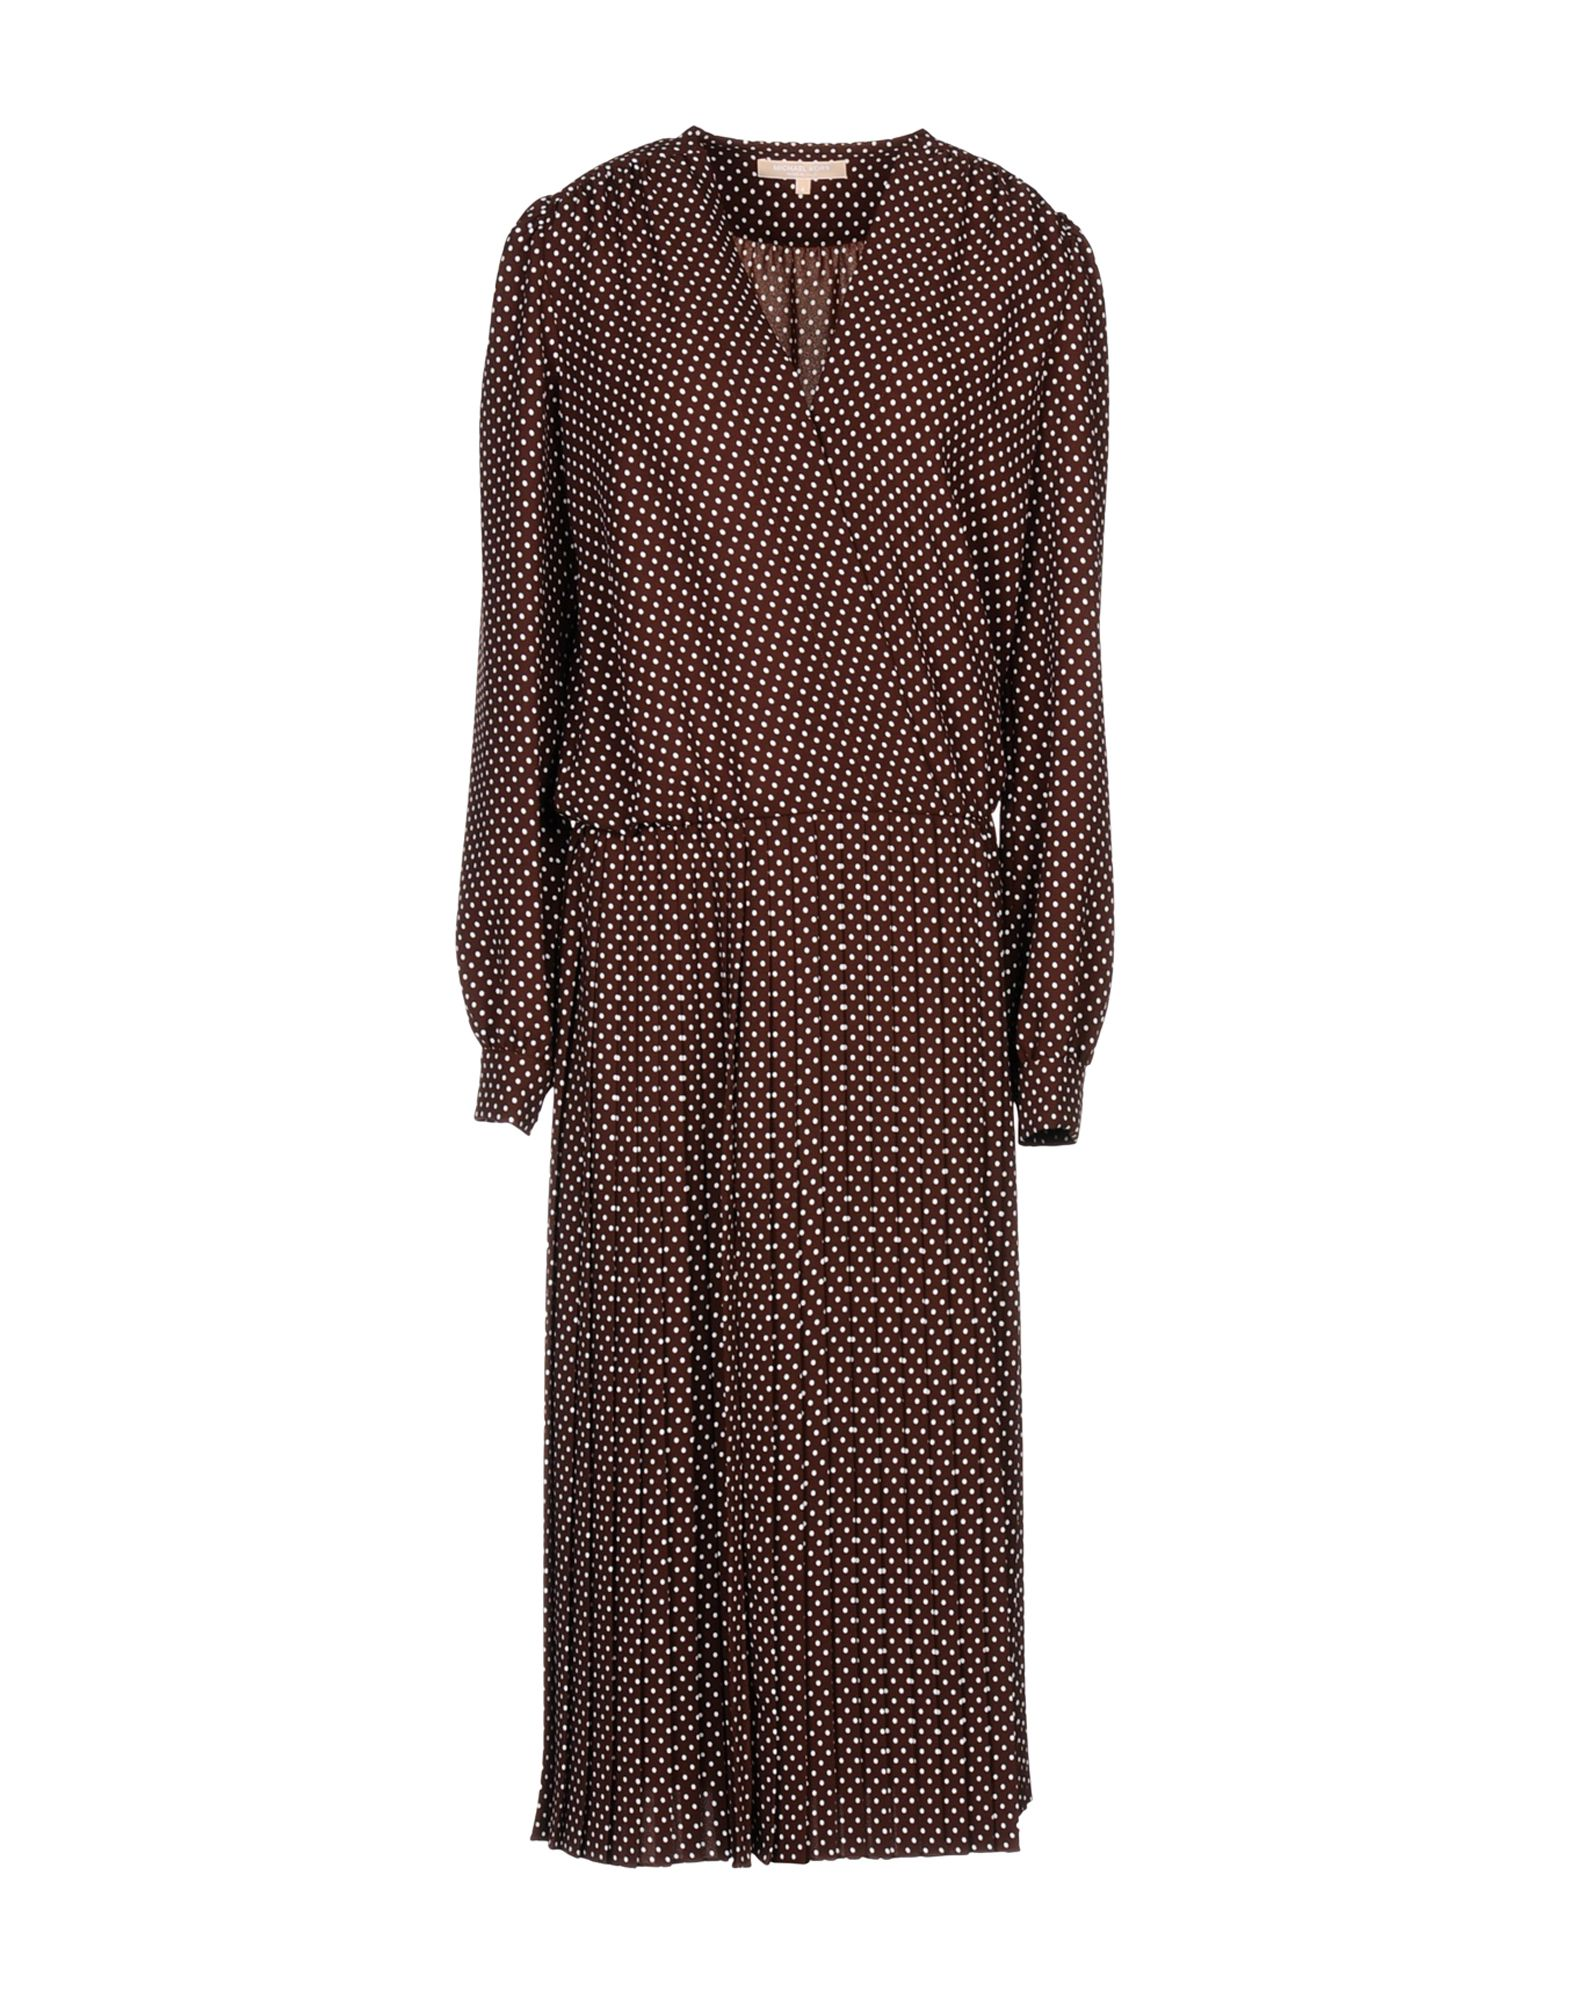 michael kors female michael kors long dresses